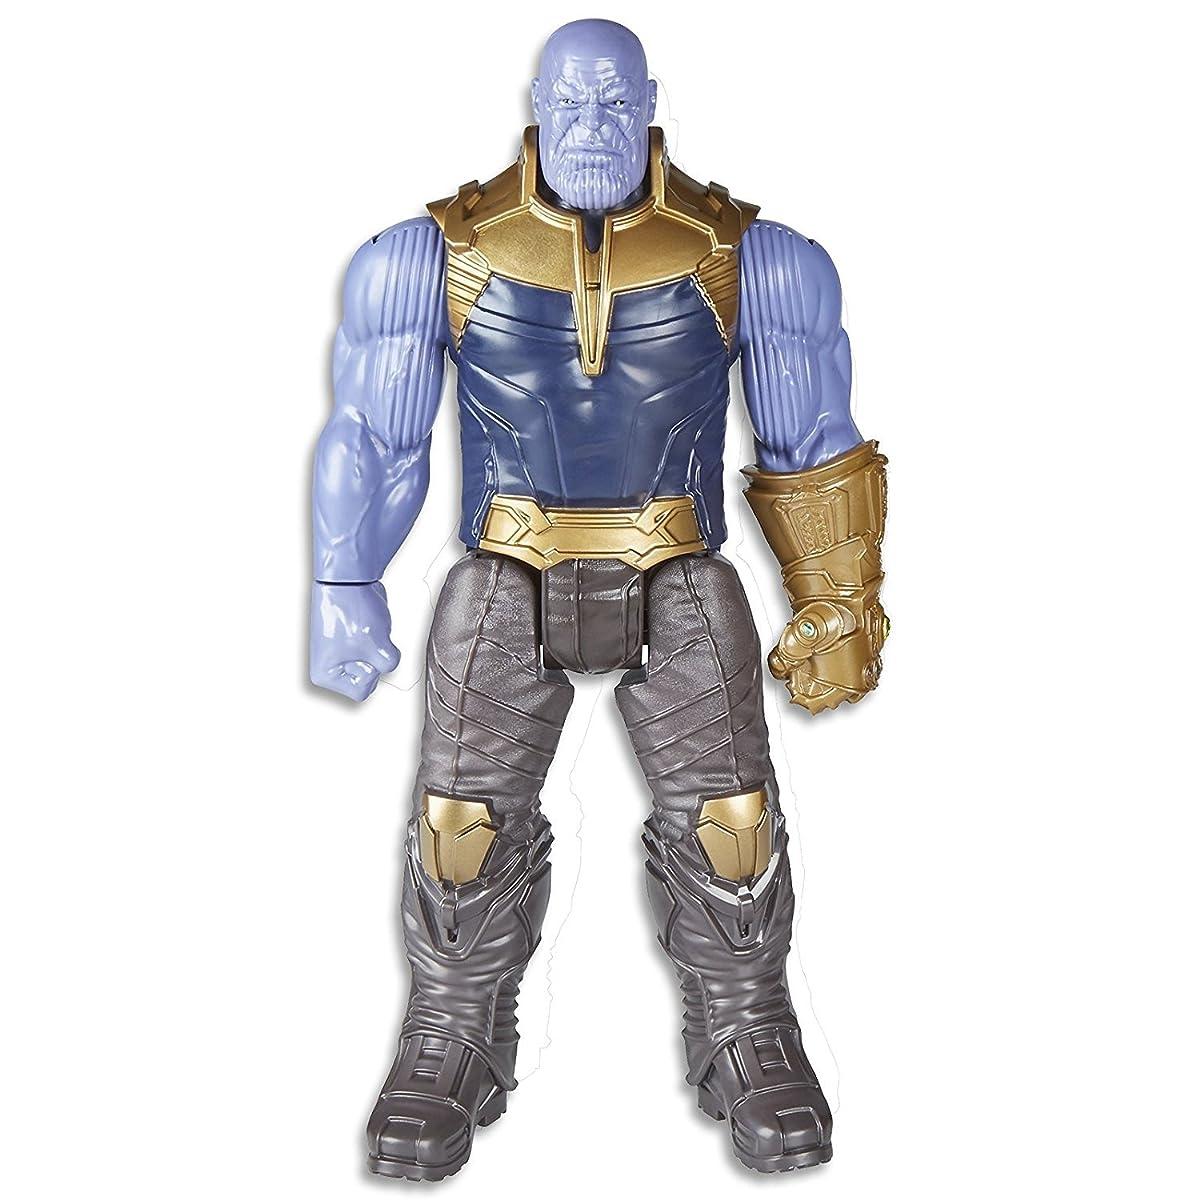 "Avengers Infinity Wars Thanos 12"" Action Figure (Basic)"